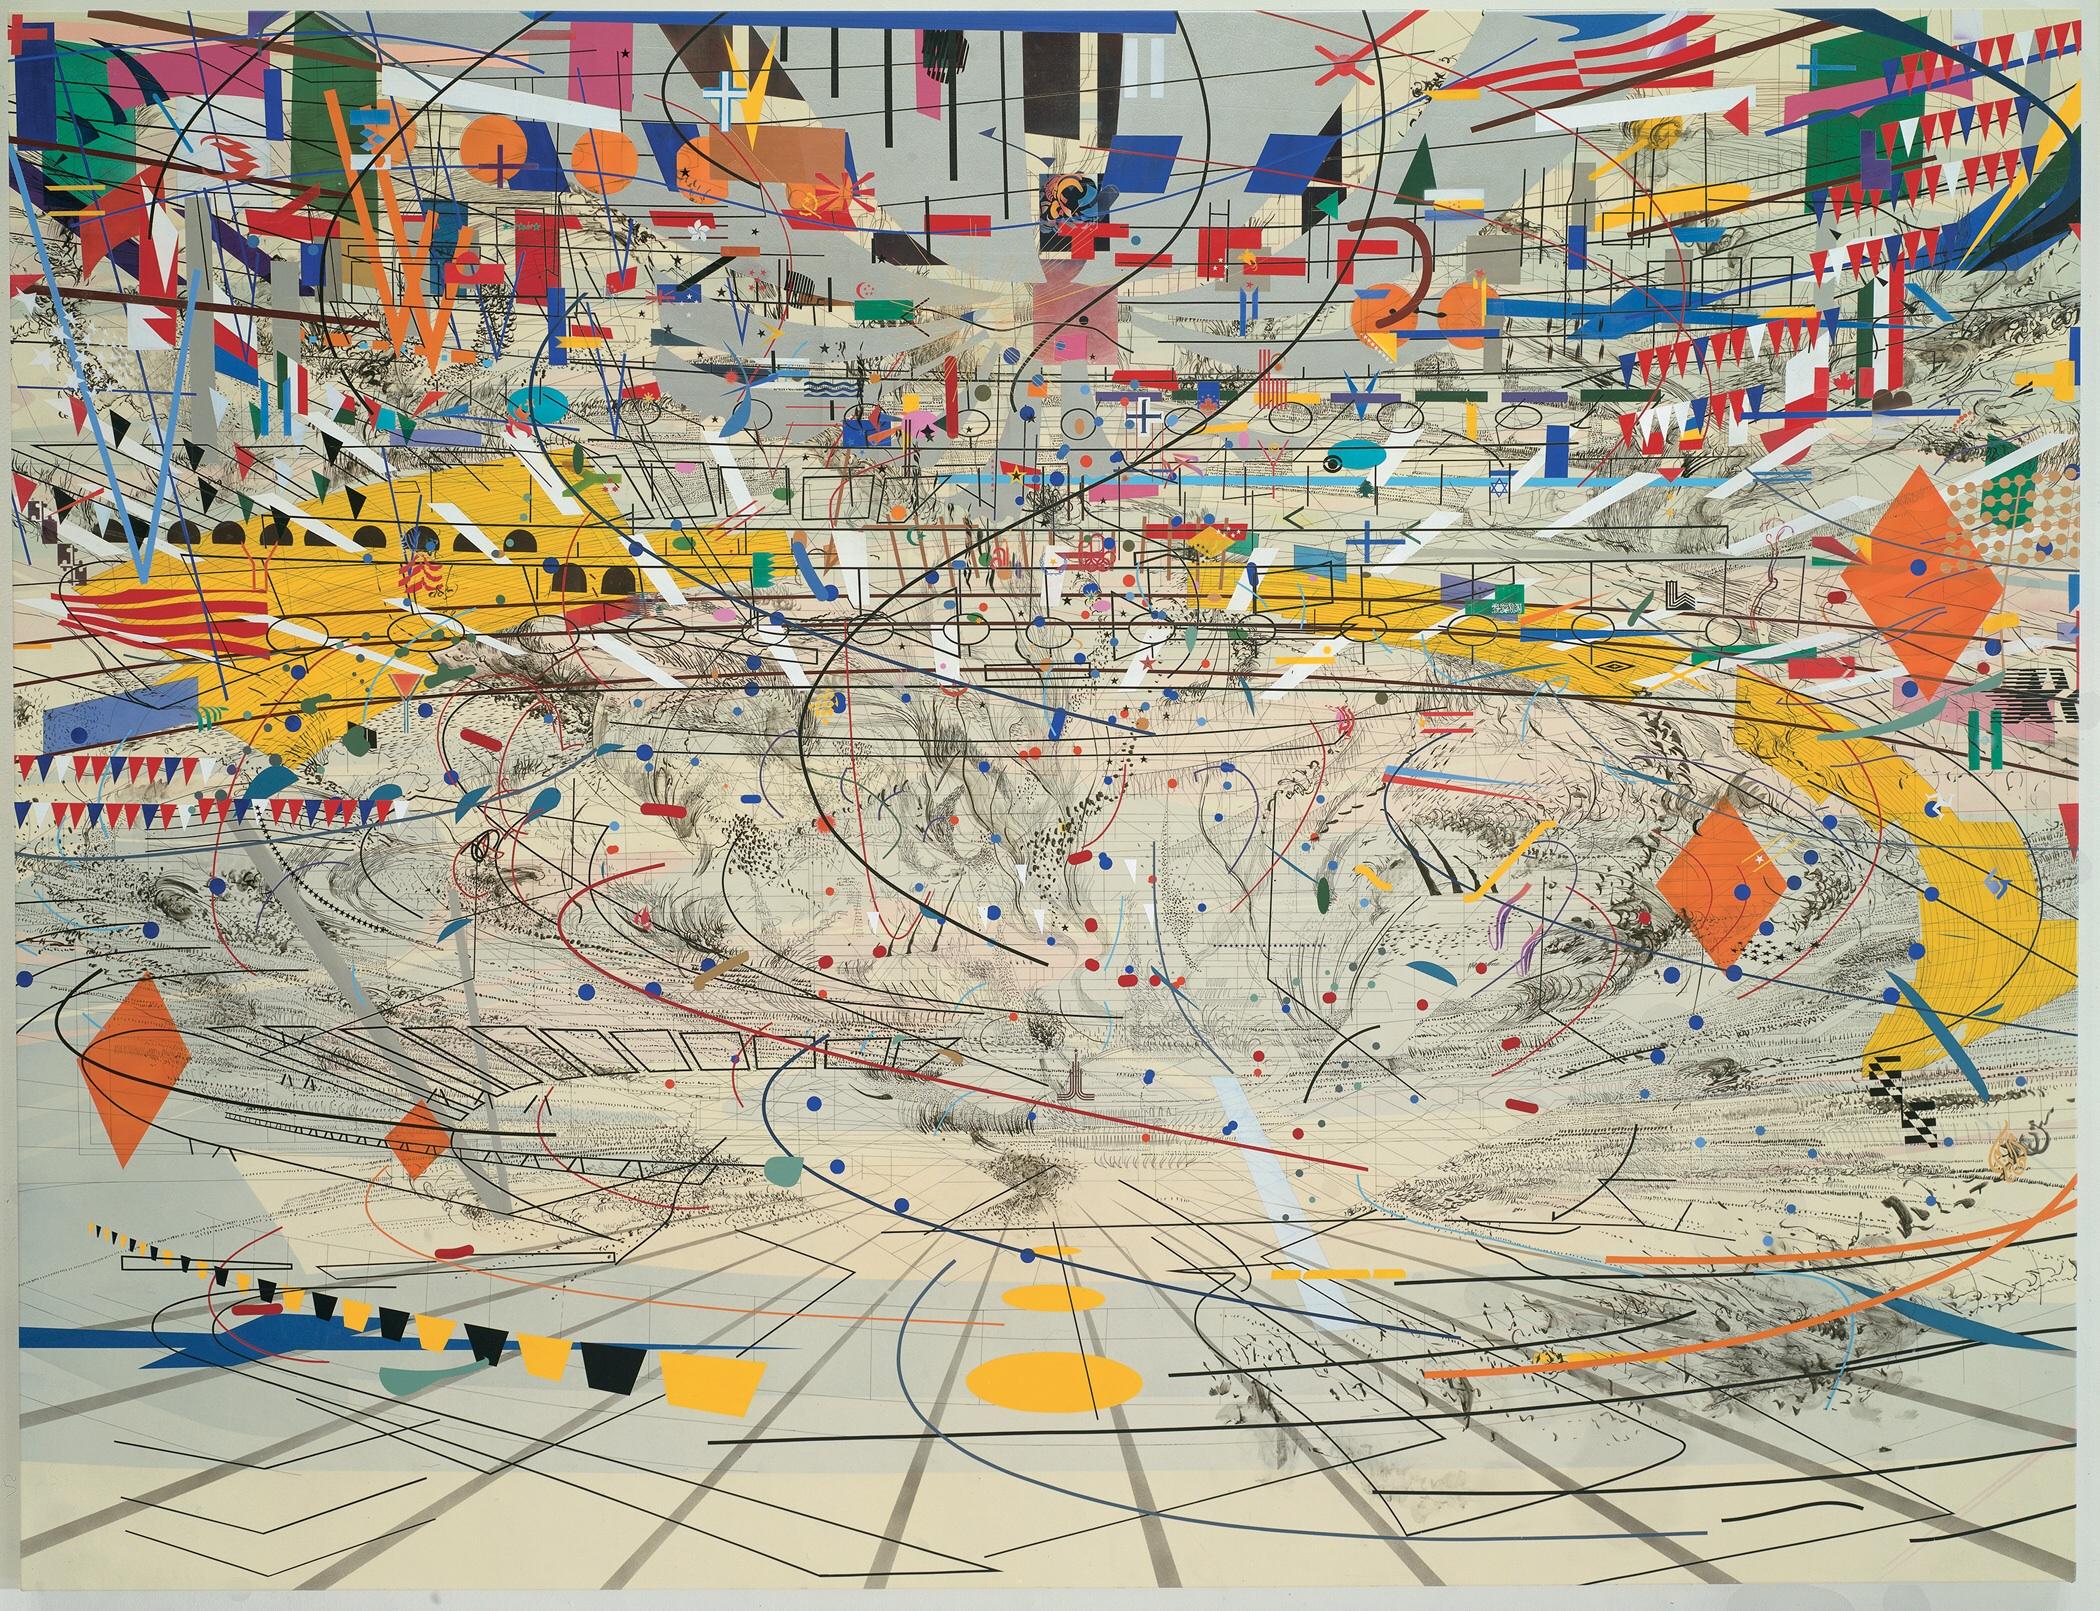 A personal analysis of the artwork stadia ii by julie mehretu